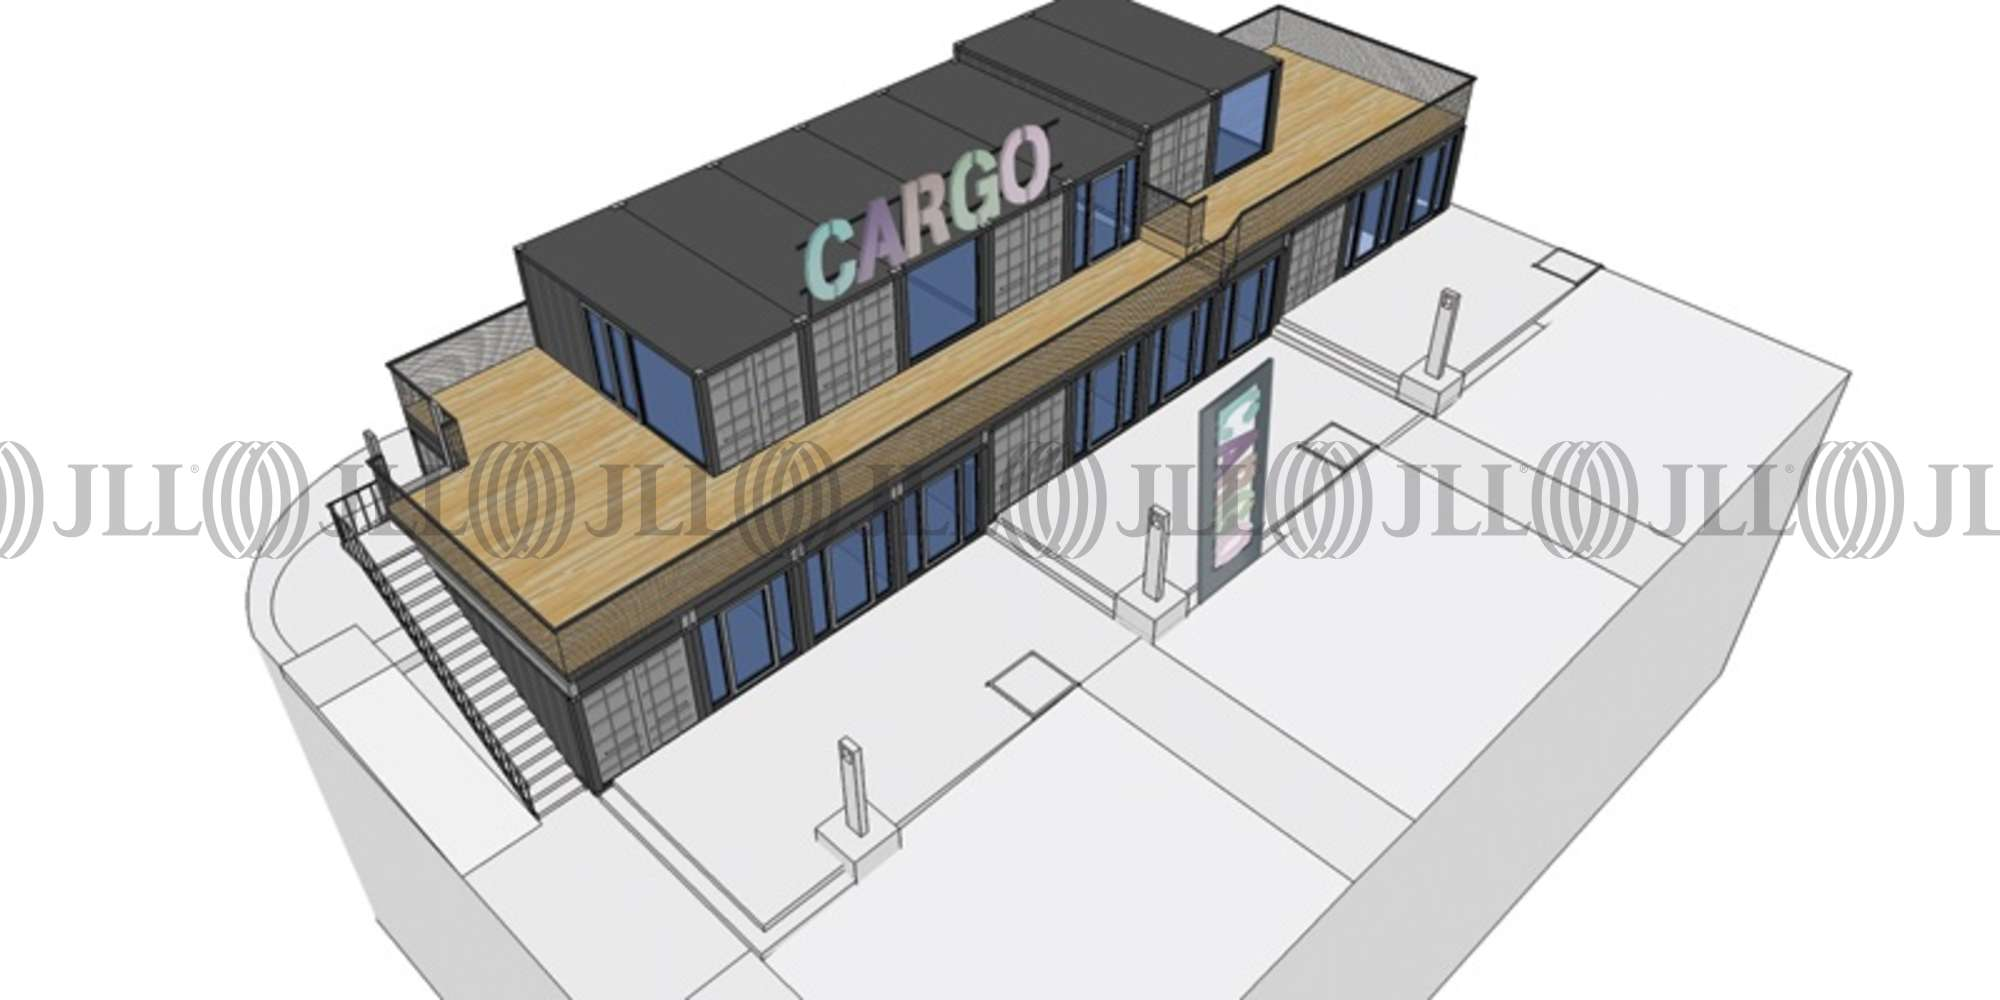 Retail high street Bristol, BS1 5WE - Cargo @ Wapping Wharf